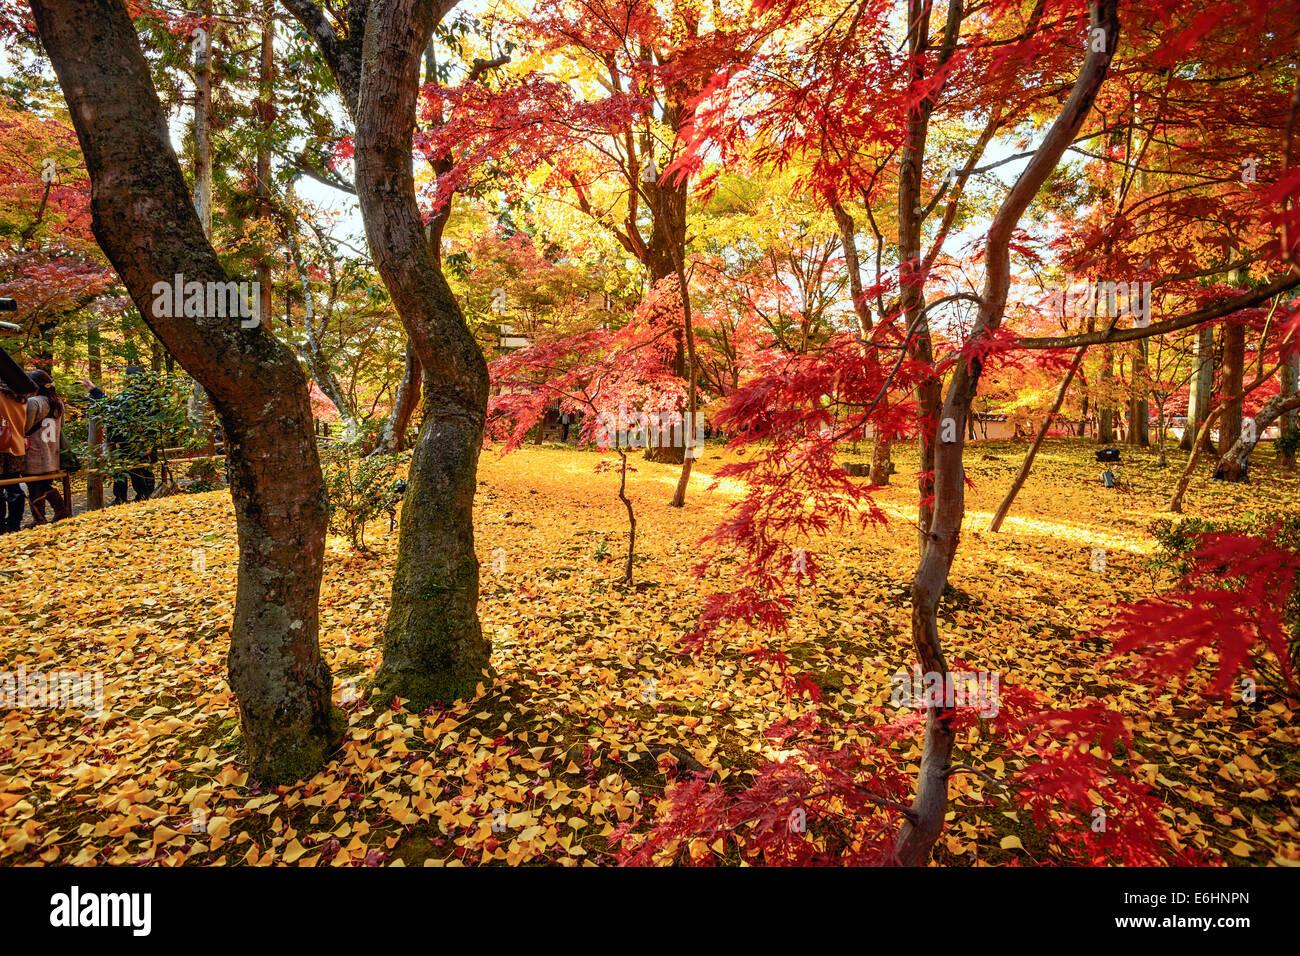 Kyoto, Japan fall foliage at Eikando Temple grounds. - Stock Image